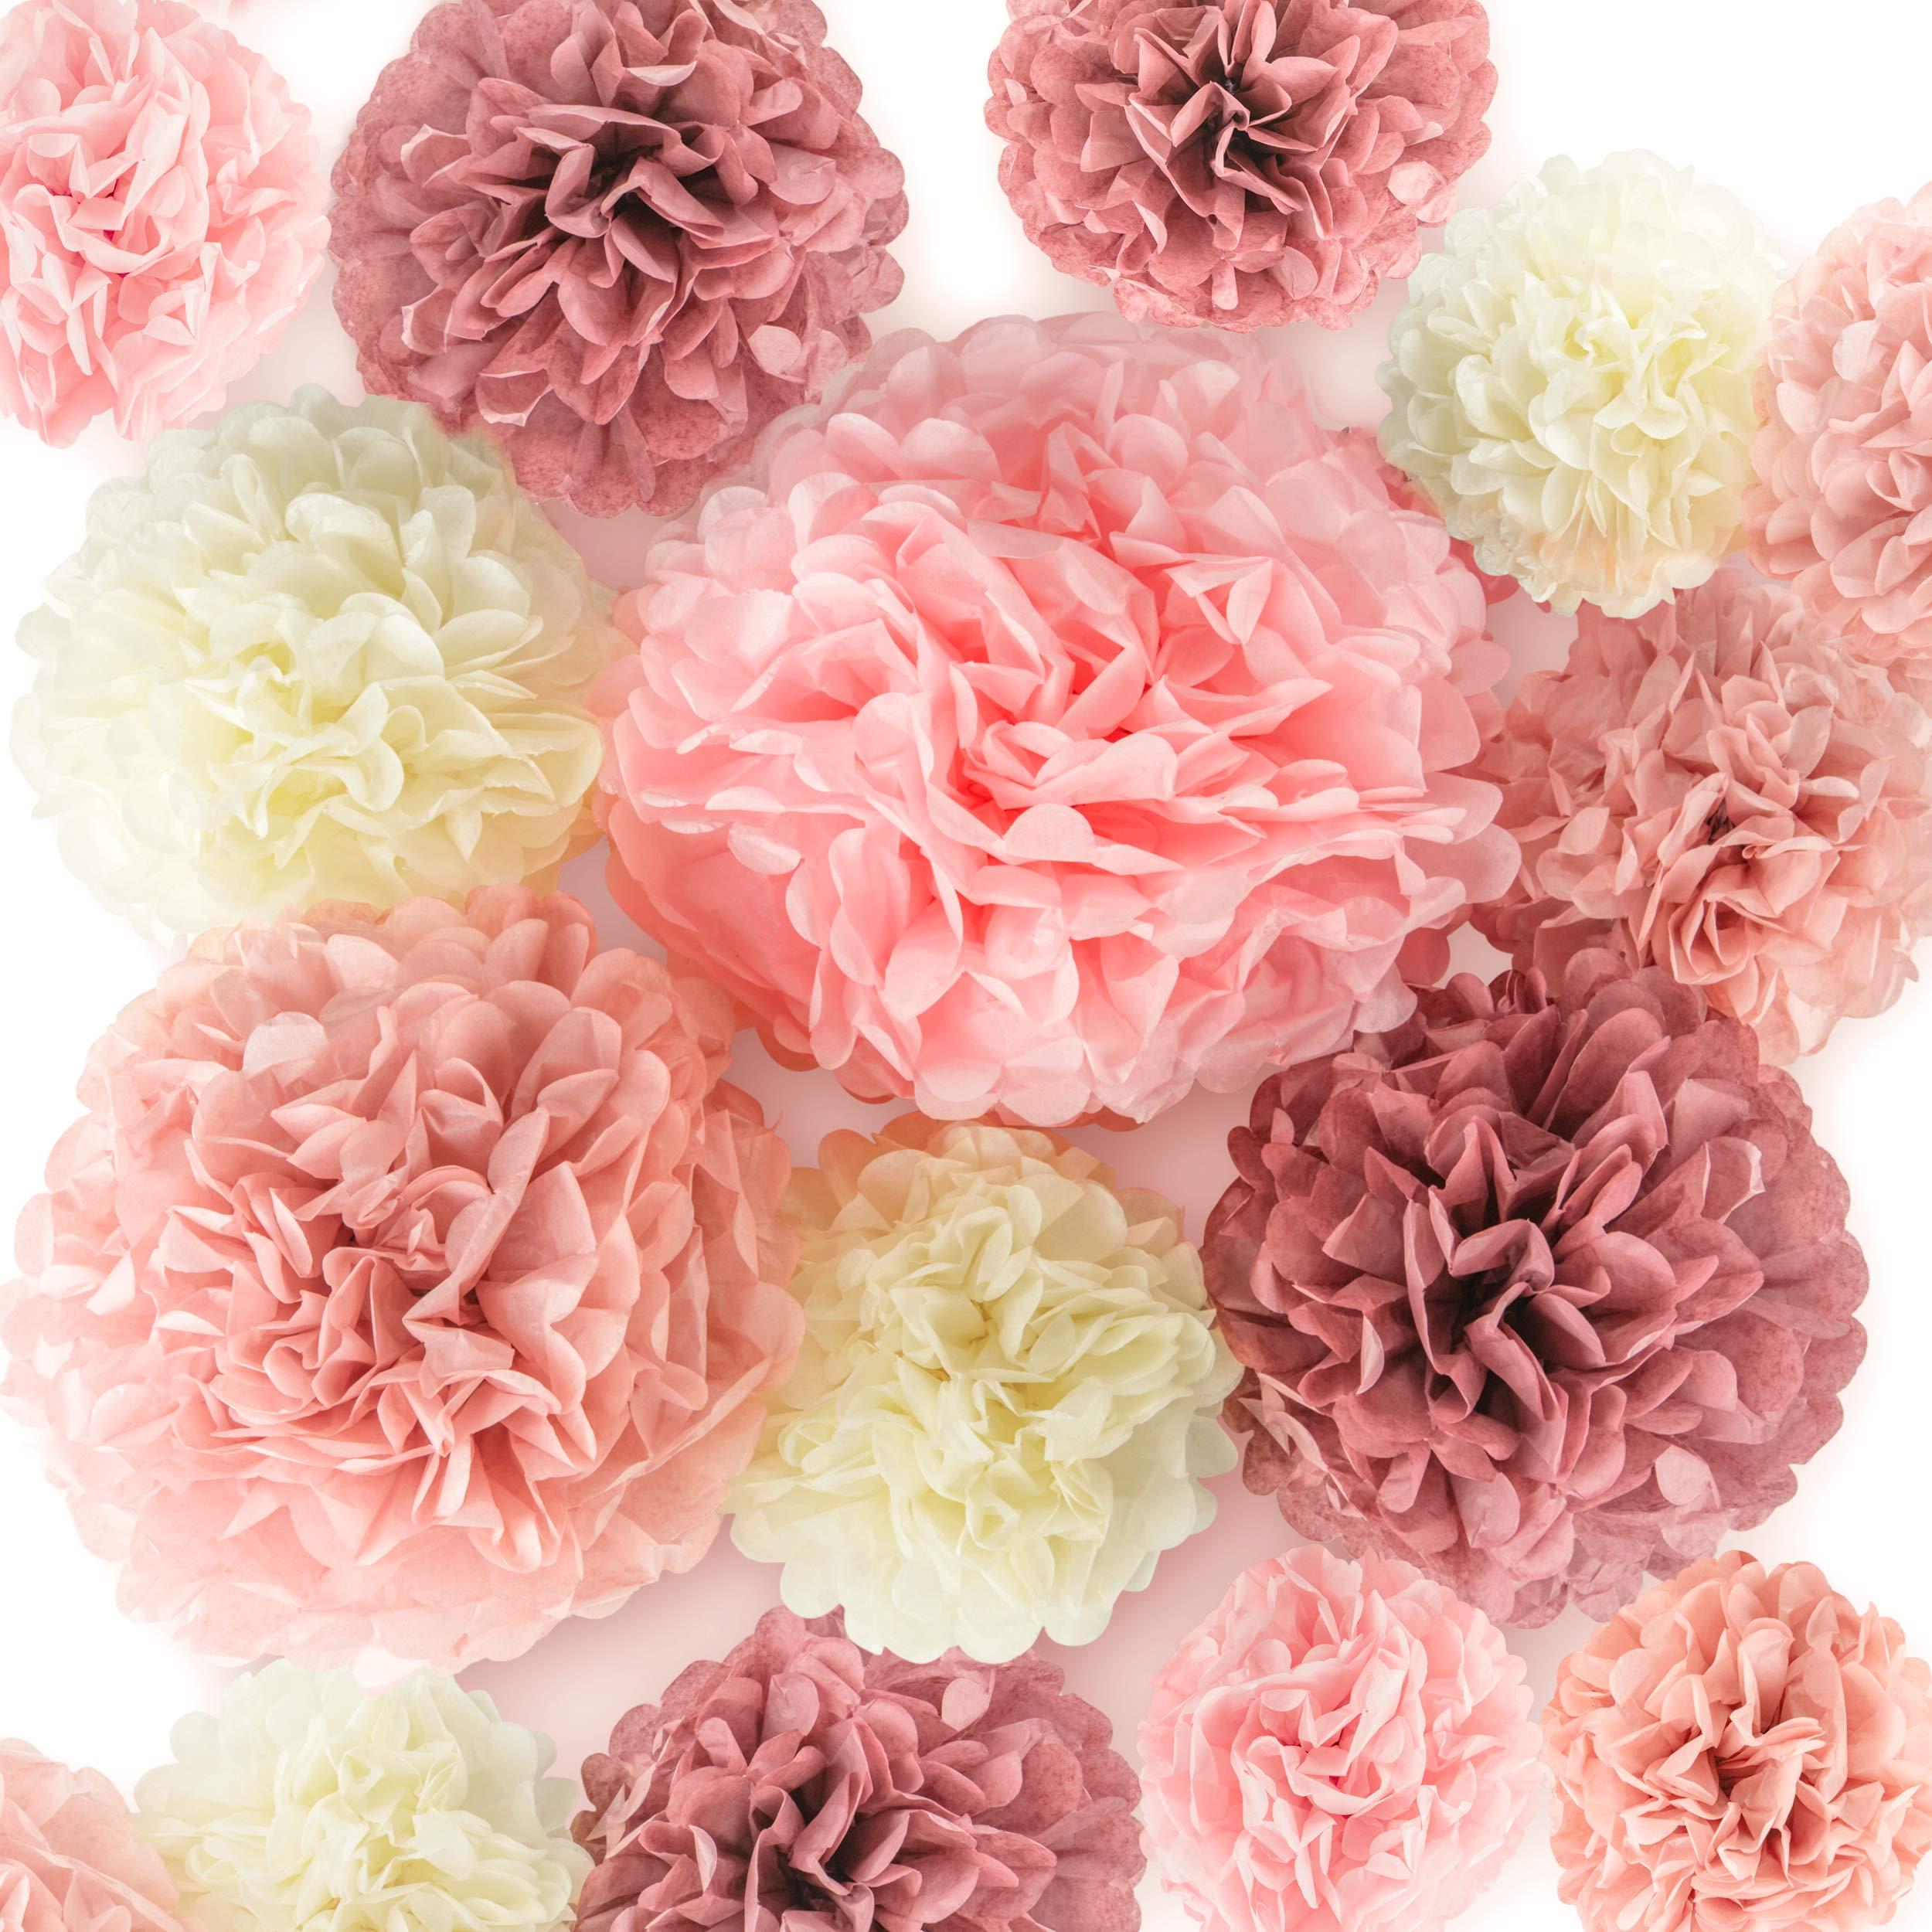 EpiqueOne 20 Pieces Blush Pink, Dusty Rose, Mauve, Cream Tissue Paper Pom Poms - Ceiling and Party Decorations - Backdrop Flowers by EPIQUEONE